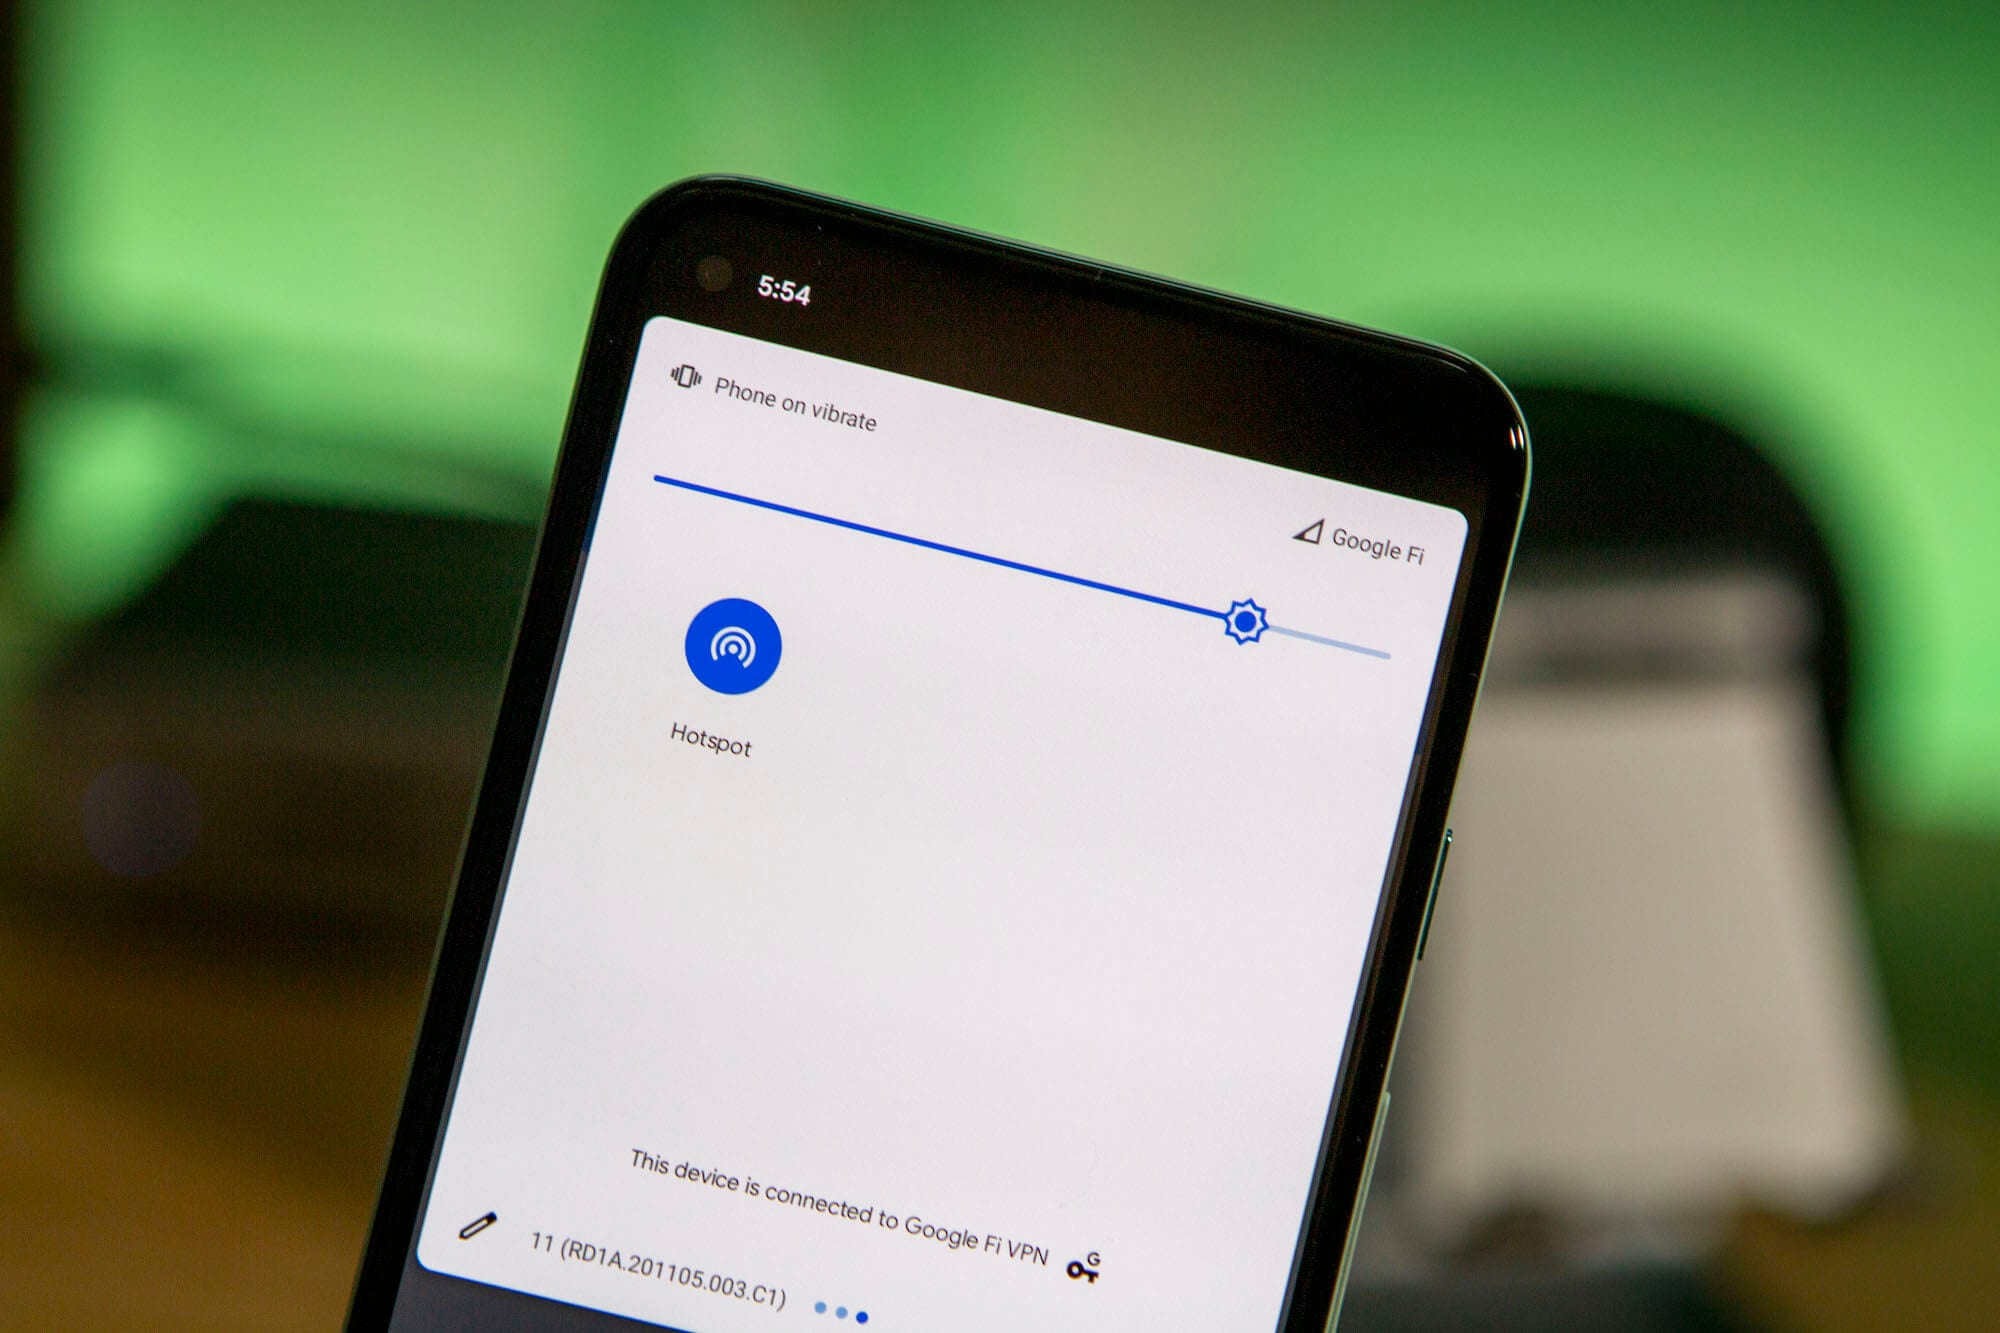 ¿No puedes conectarte a tu hotspot en Android?  Como arreglar